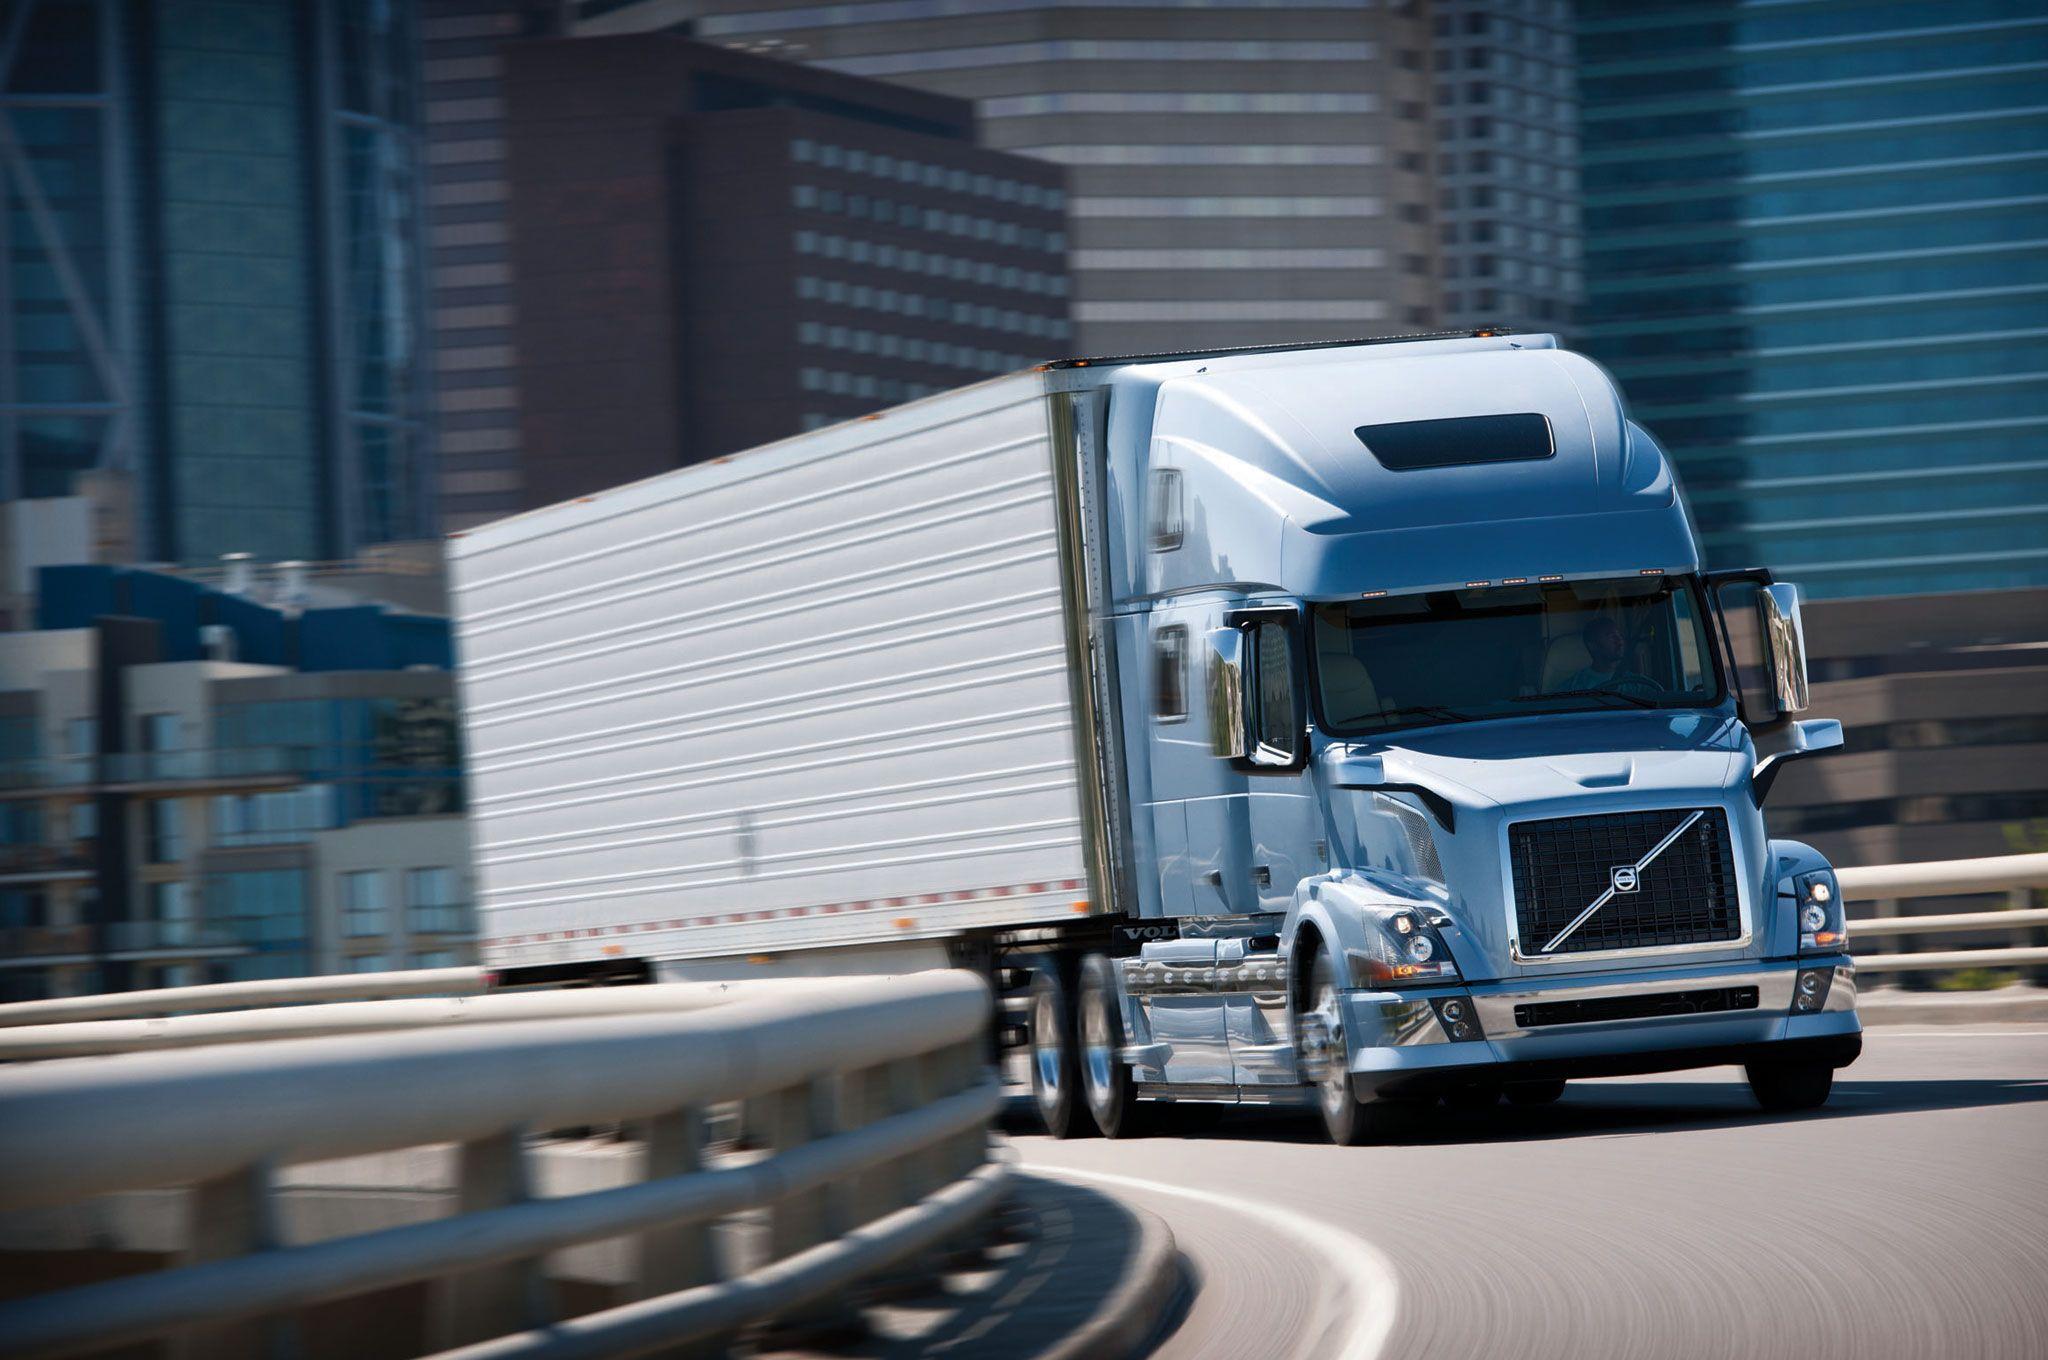 aftermarket for volvo stainless truck parts semi steel dieter trucks part accessories s